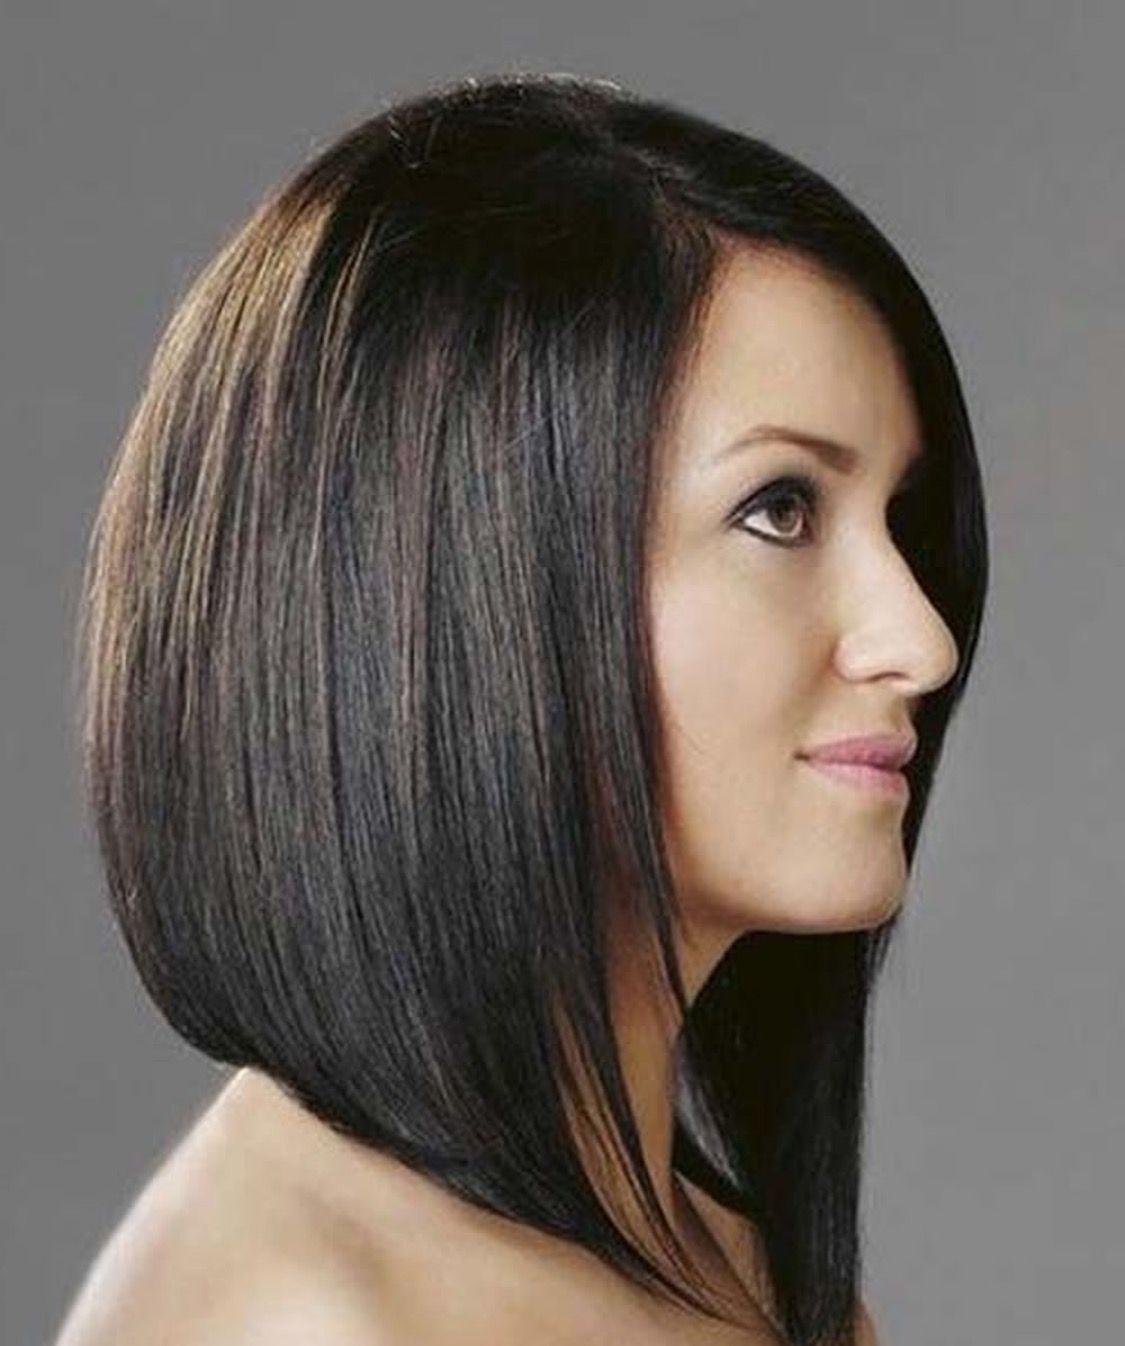 new style haircut girl 2018 - wavy haircut